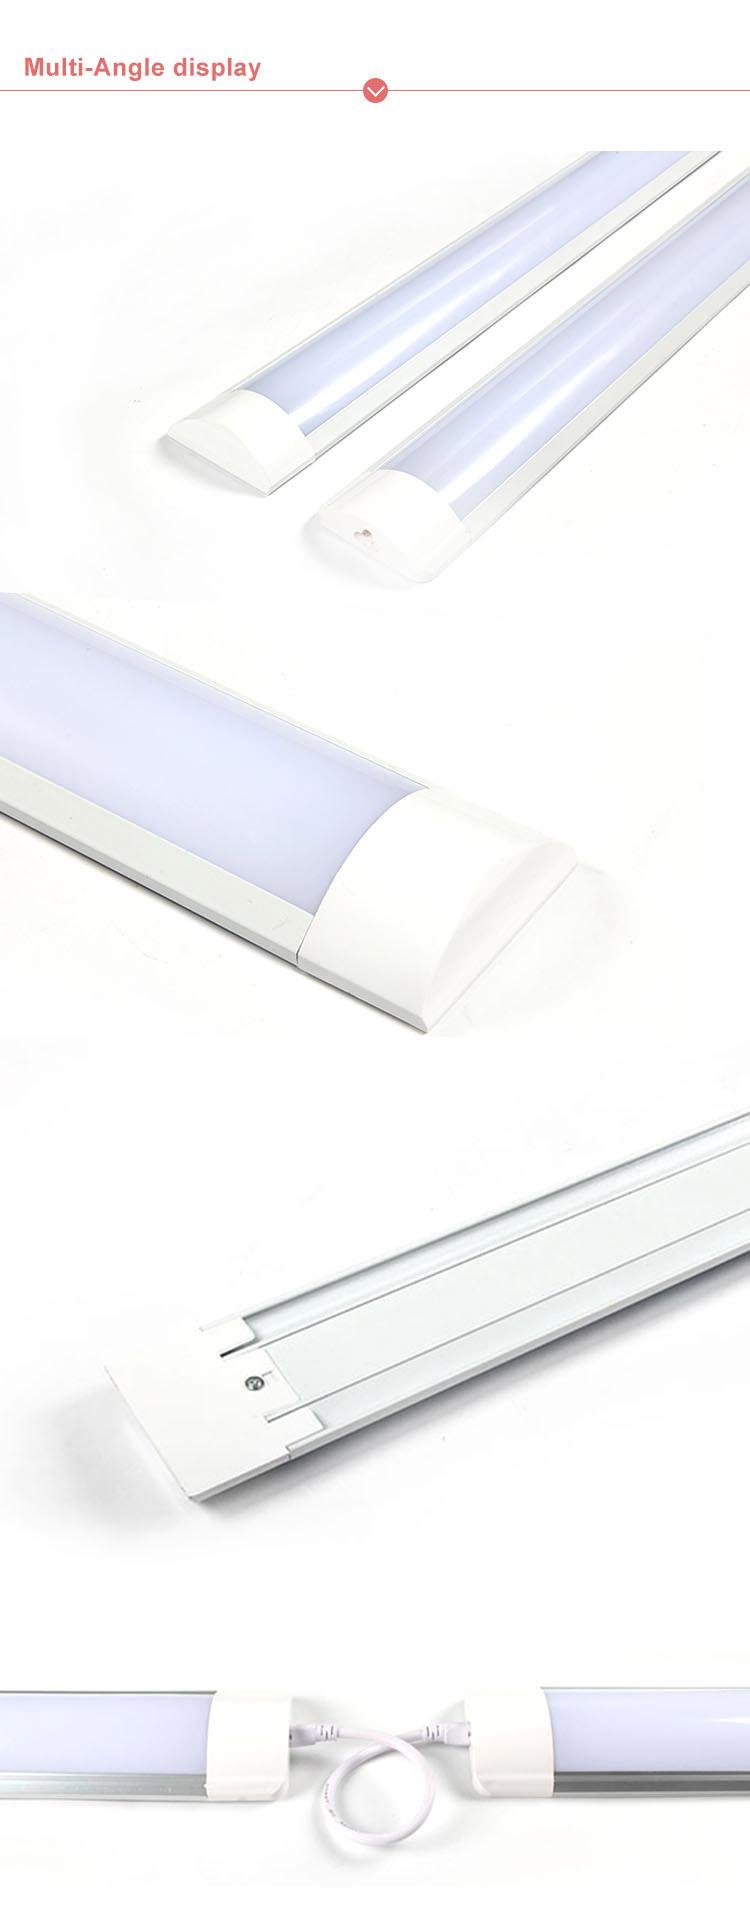 Teluk Tinggi Linier Lampu LED Industri LED Lampu Batten 4ft 8ft 36 W 72 W Super Kecerahan LED Batten 1200